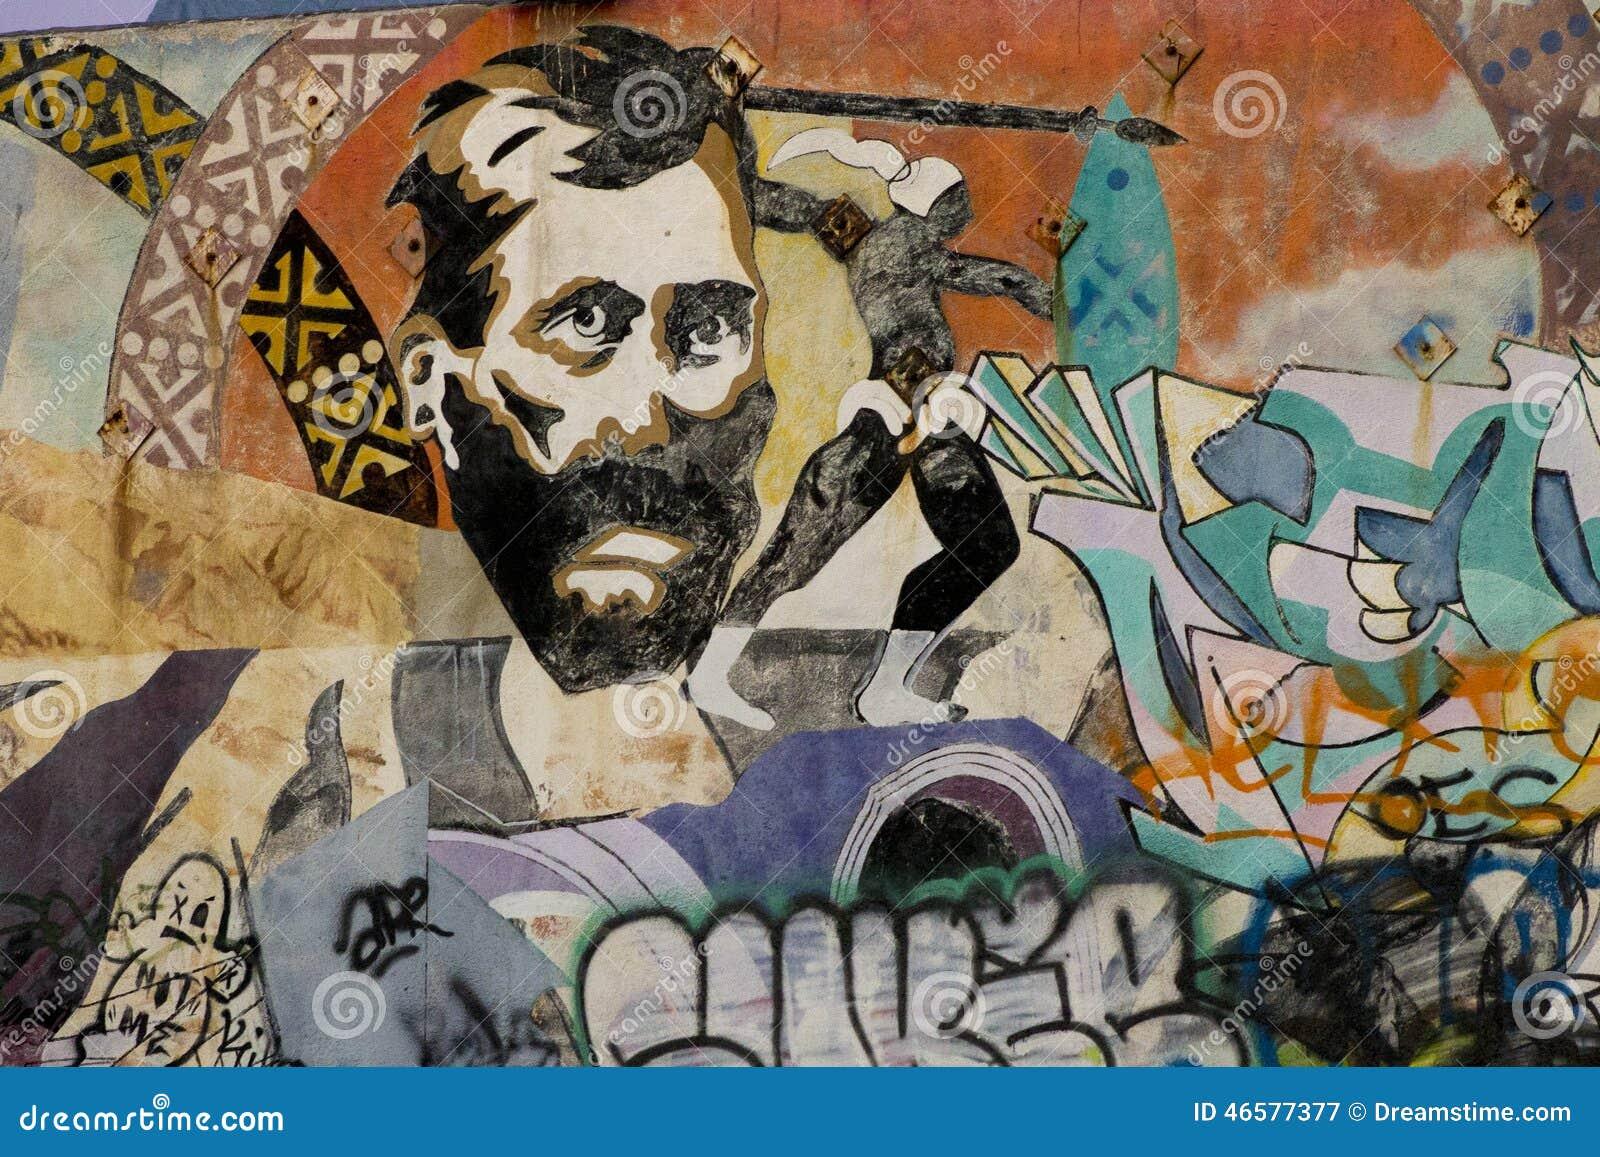 Grafitti wall painting - Man S Face Painted On Graffiti Wall Editorial Photography